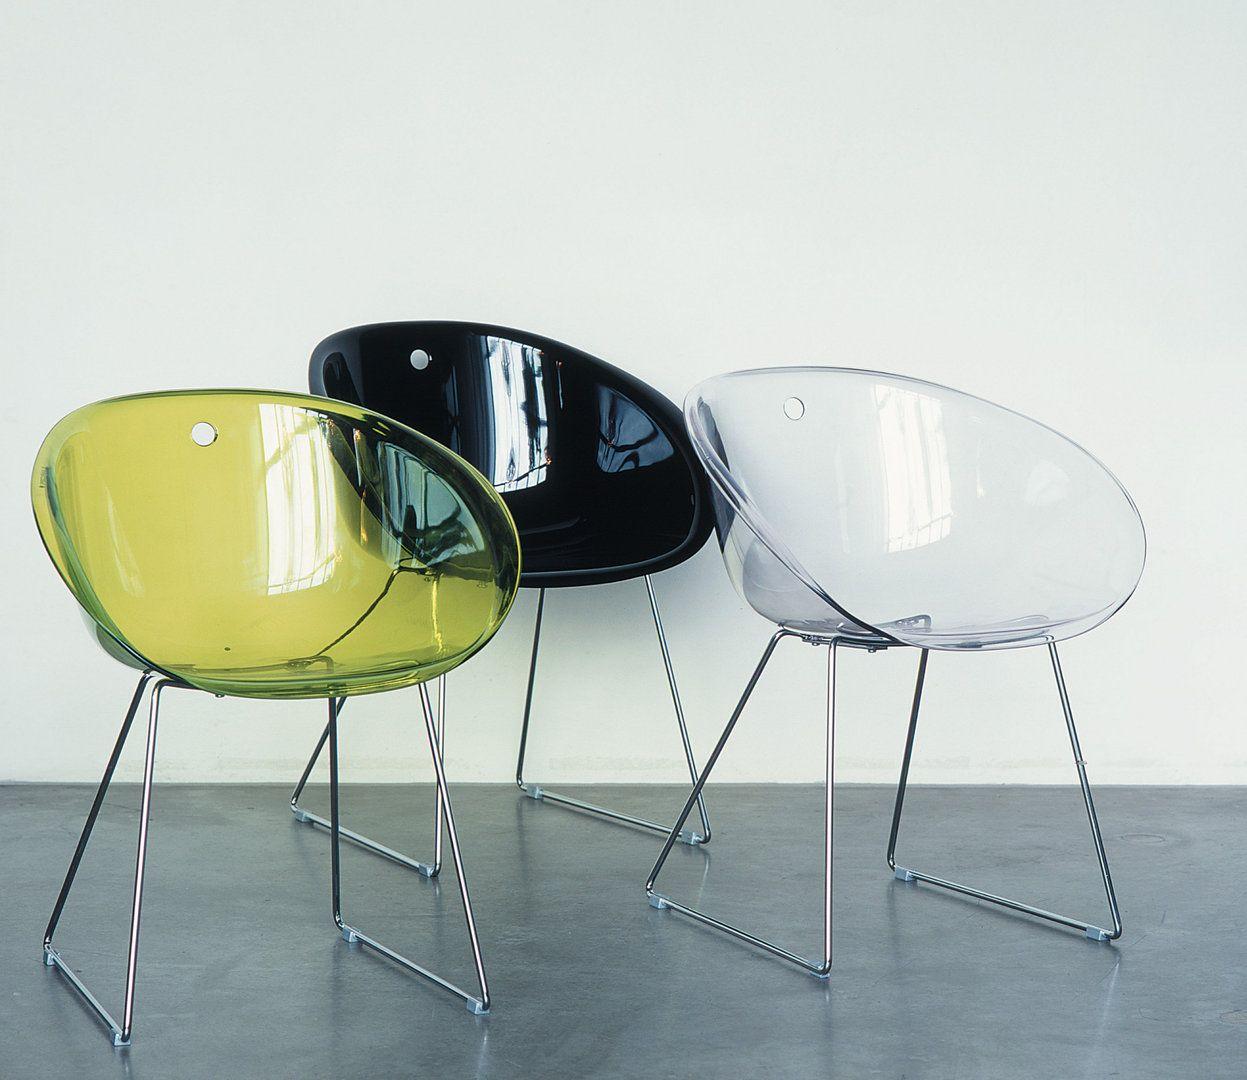 Pedrali gliss stuhl schalenstuhl sillas pinterest for Design stuhl range